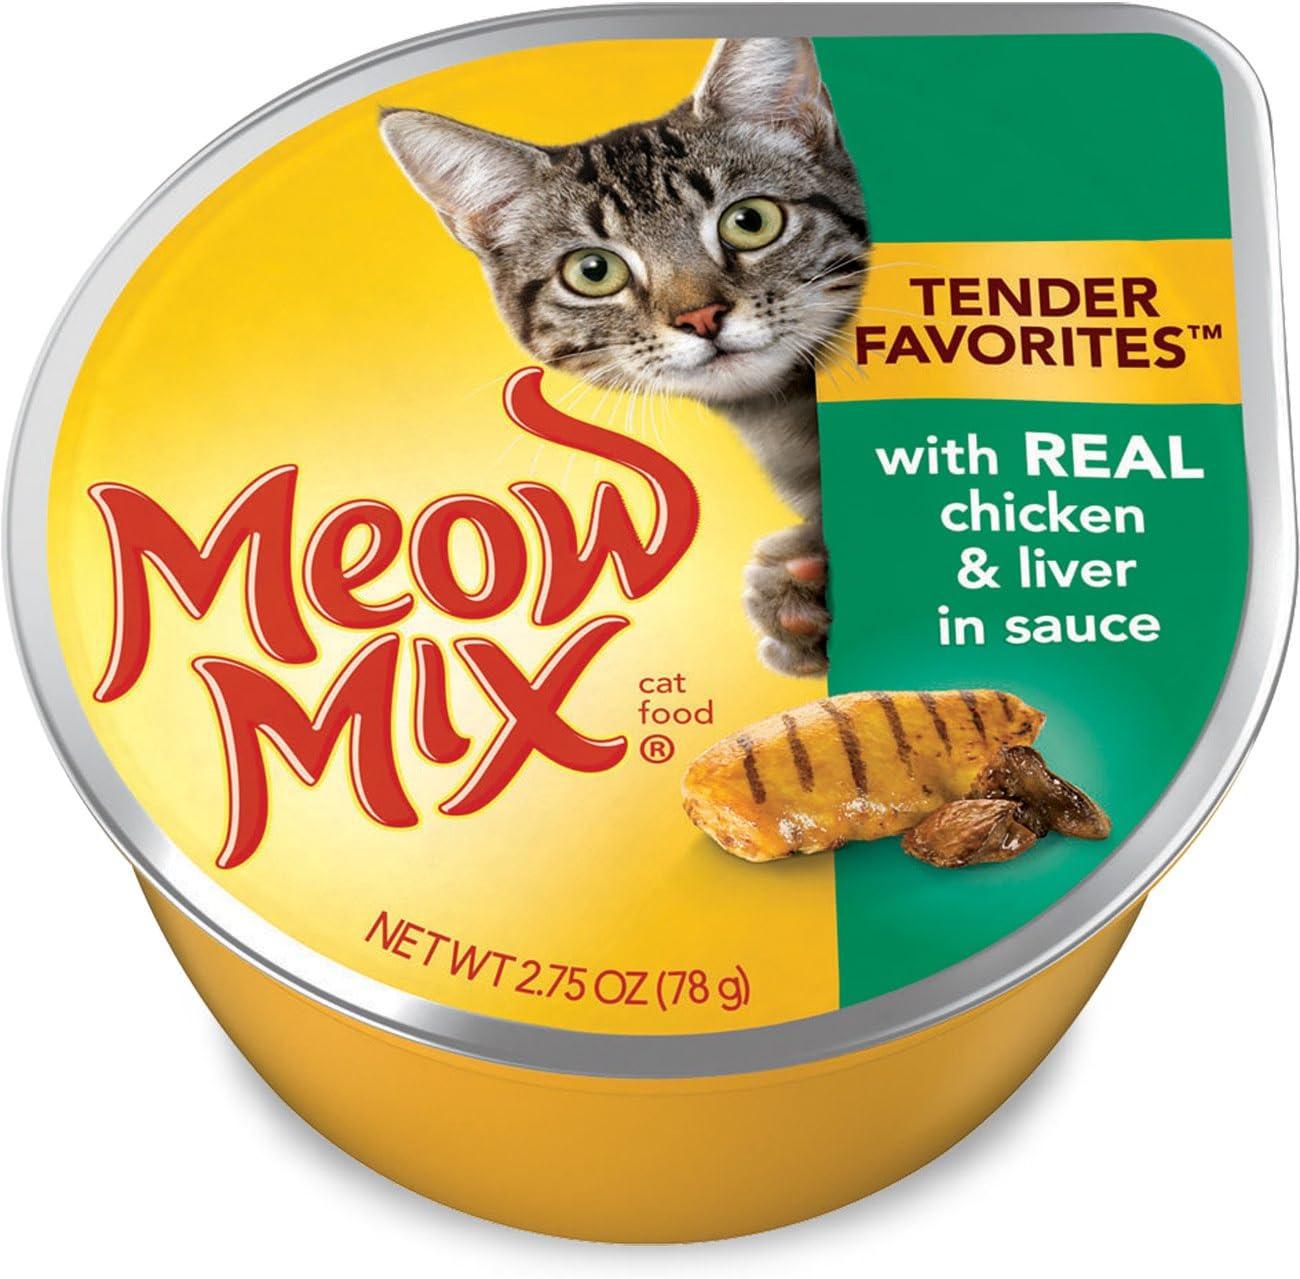 Meow Mix Tender Favorites Wet Cat Food